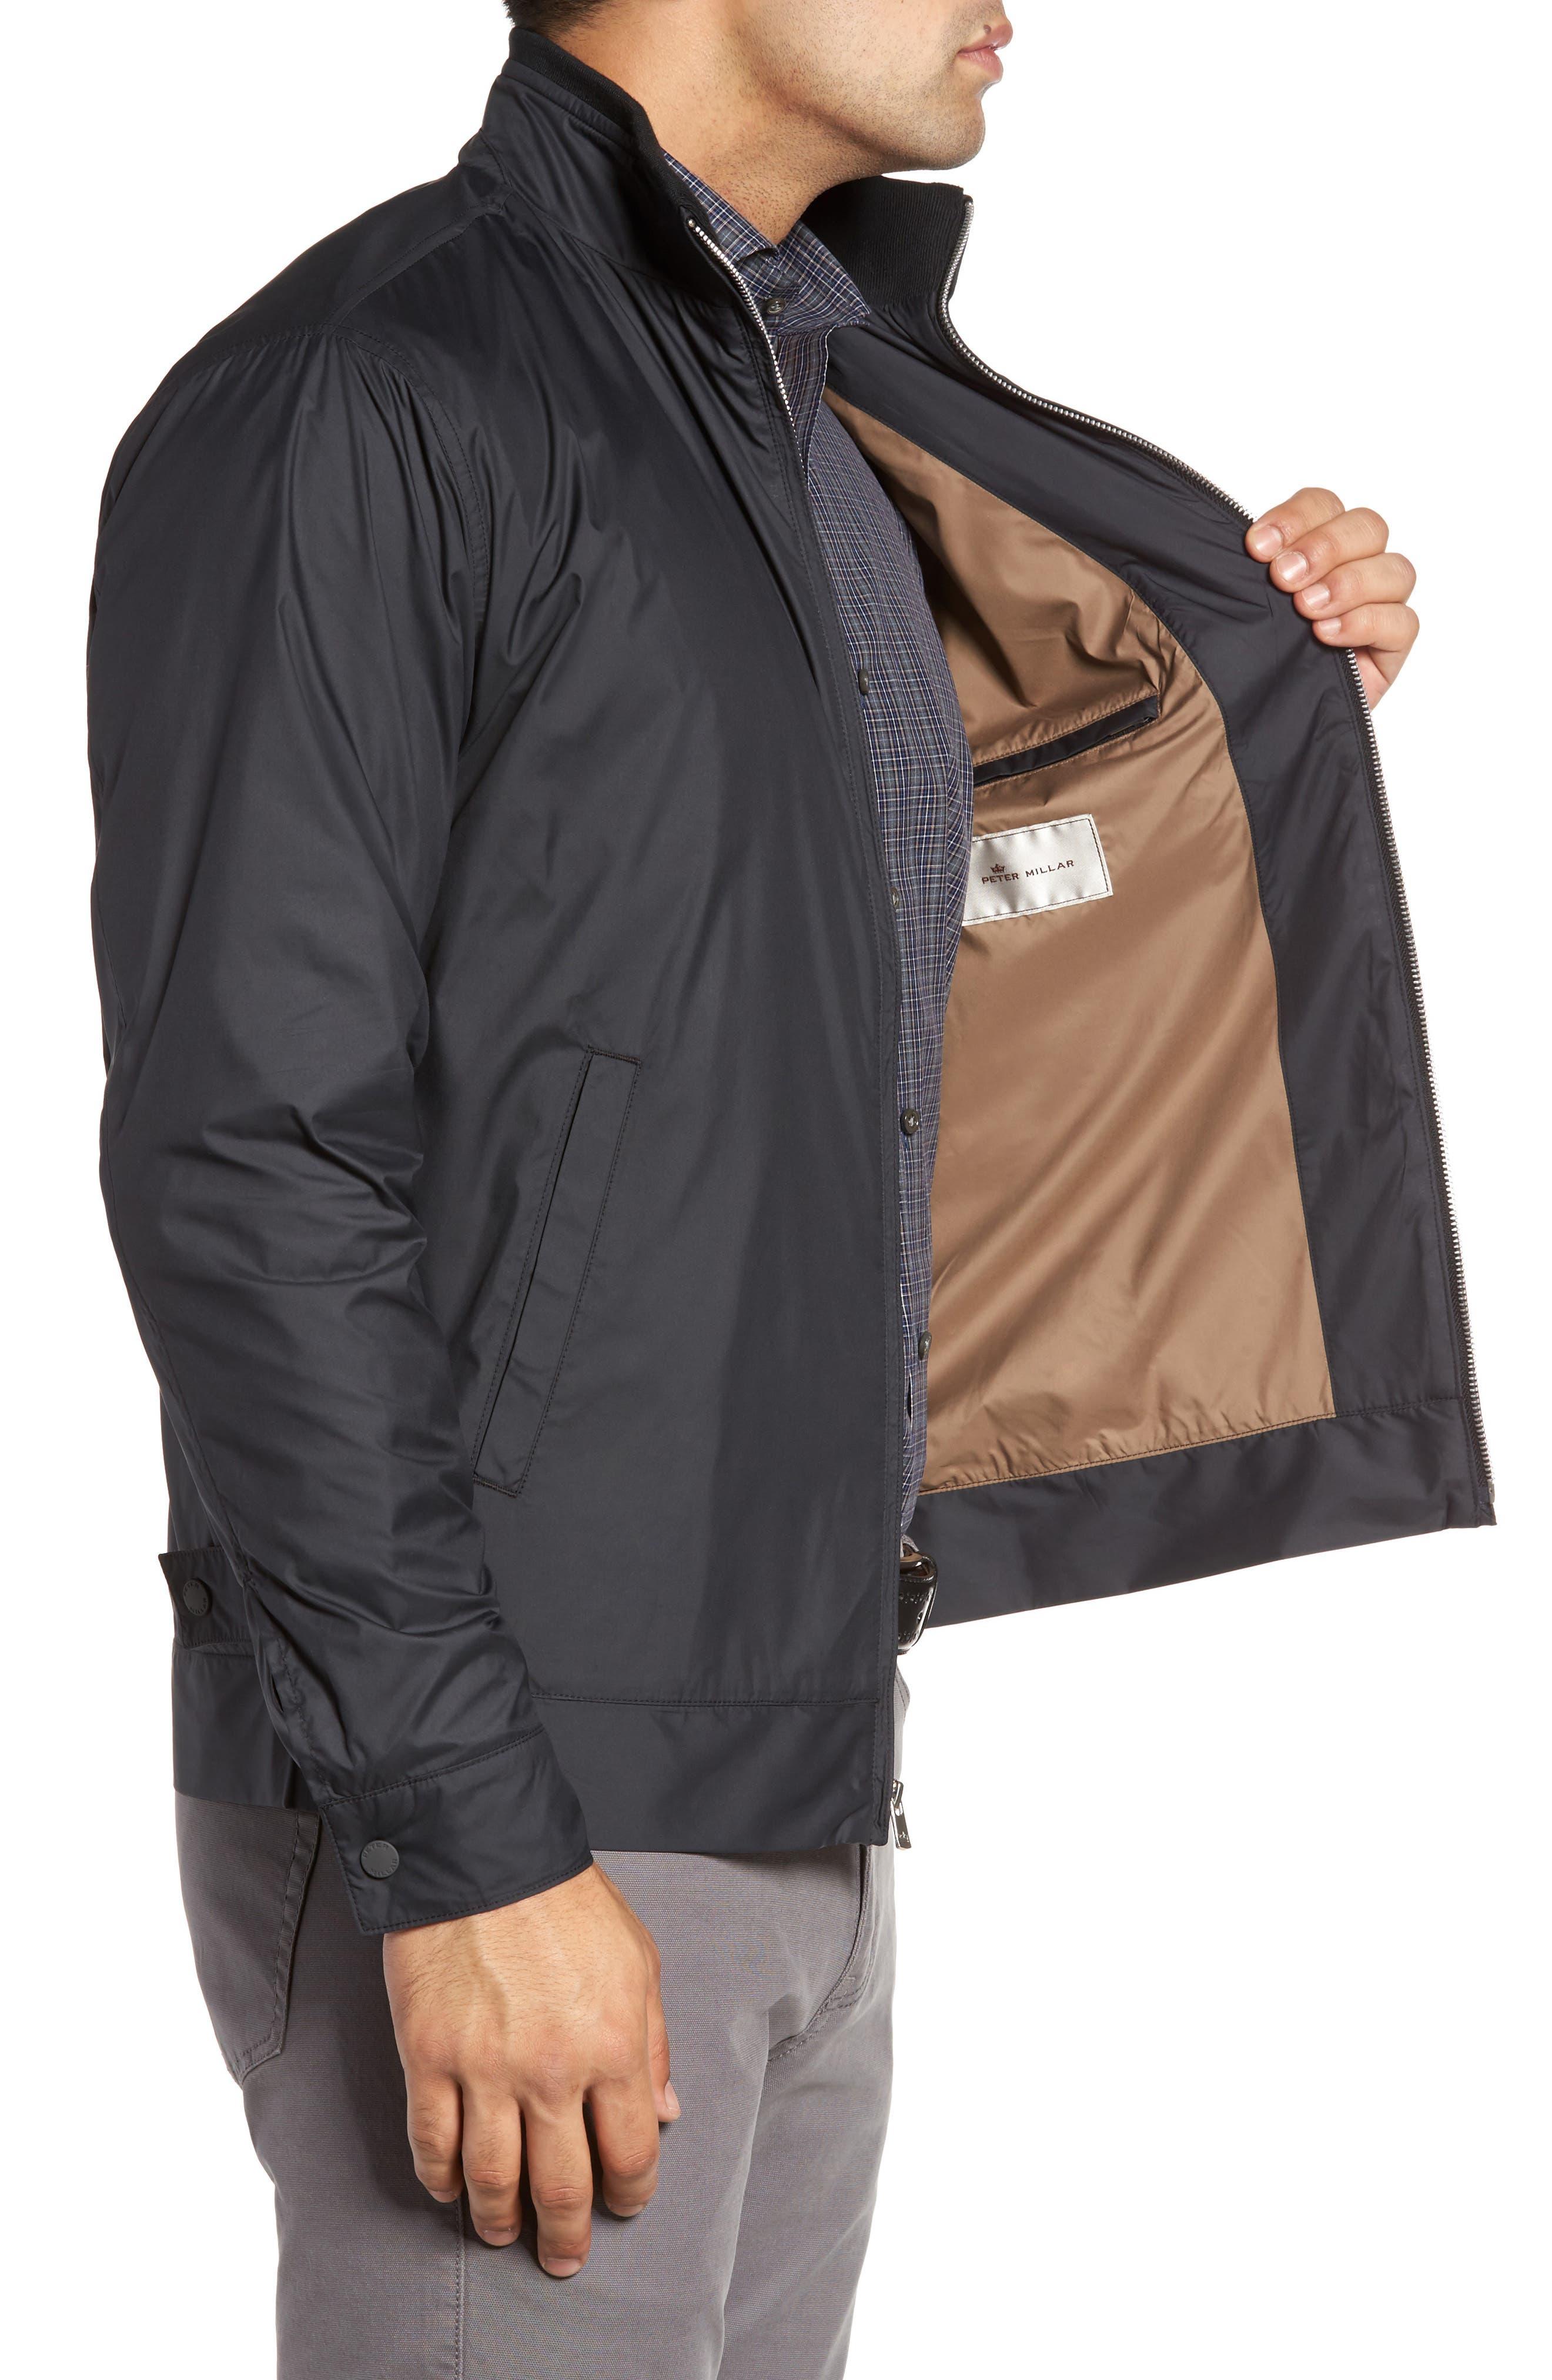 PETER MILLAR, Zip Jacket, Alternate thumbnail 4, color, BLACK